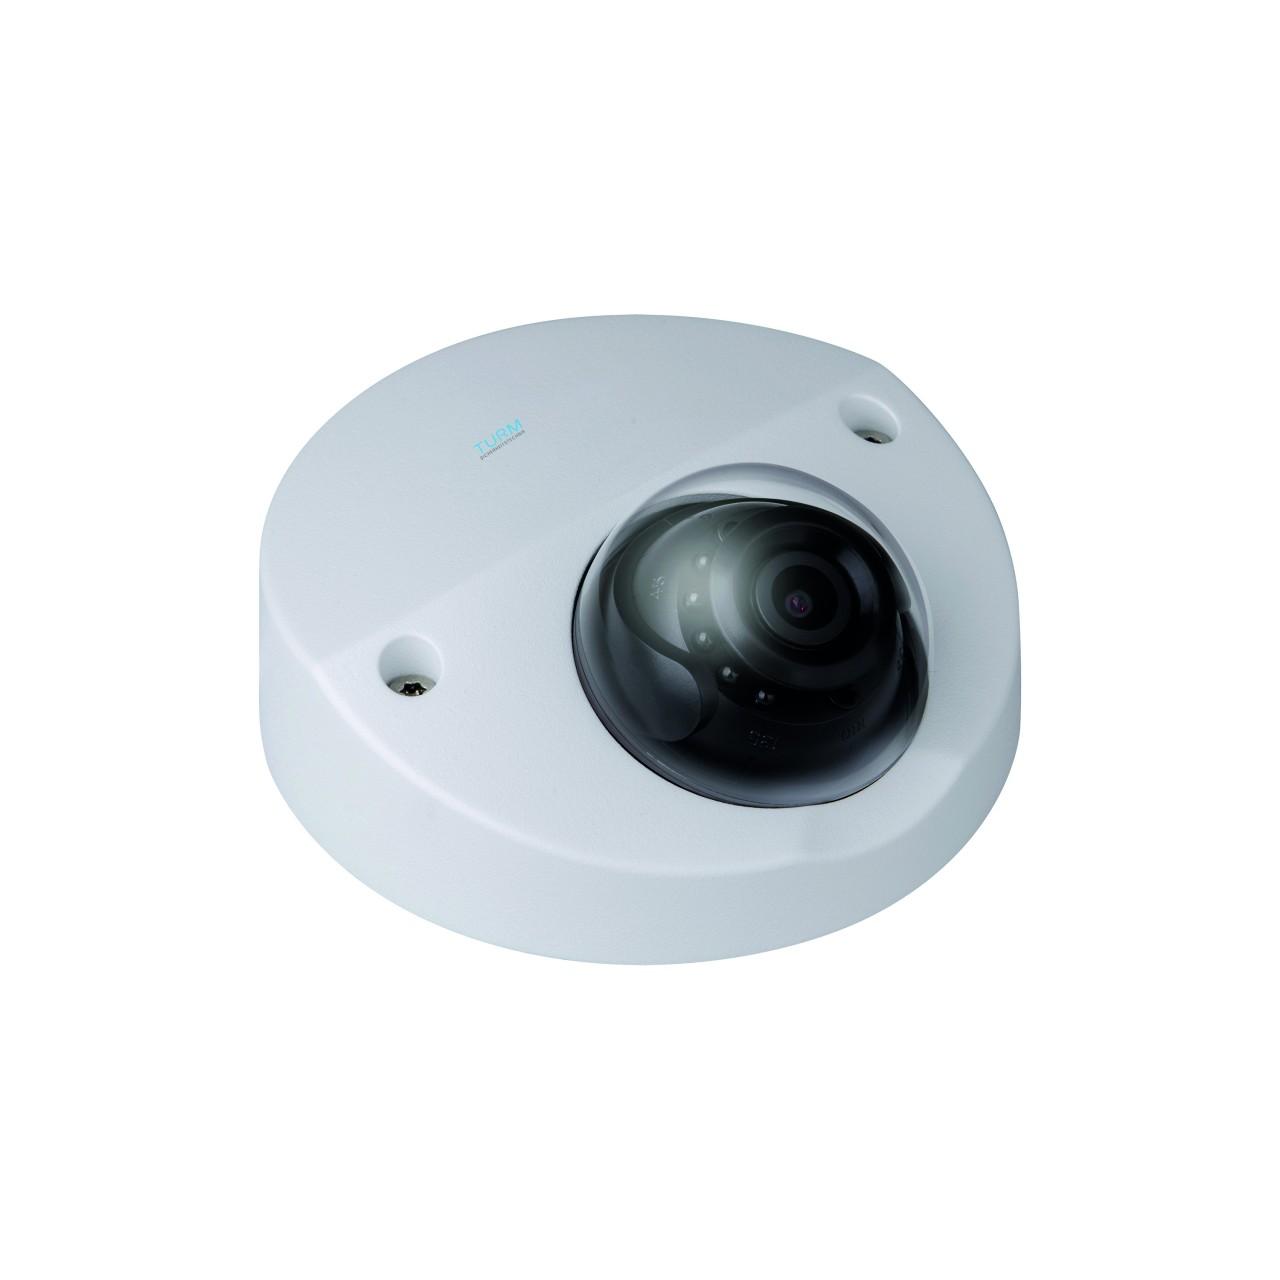 TURM HDCVI Professional 2 MP Dome Kamera mit Mikrofon, 20m Nachtsicht, Starlight, 2.8mm Objektiv mit